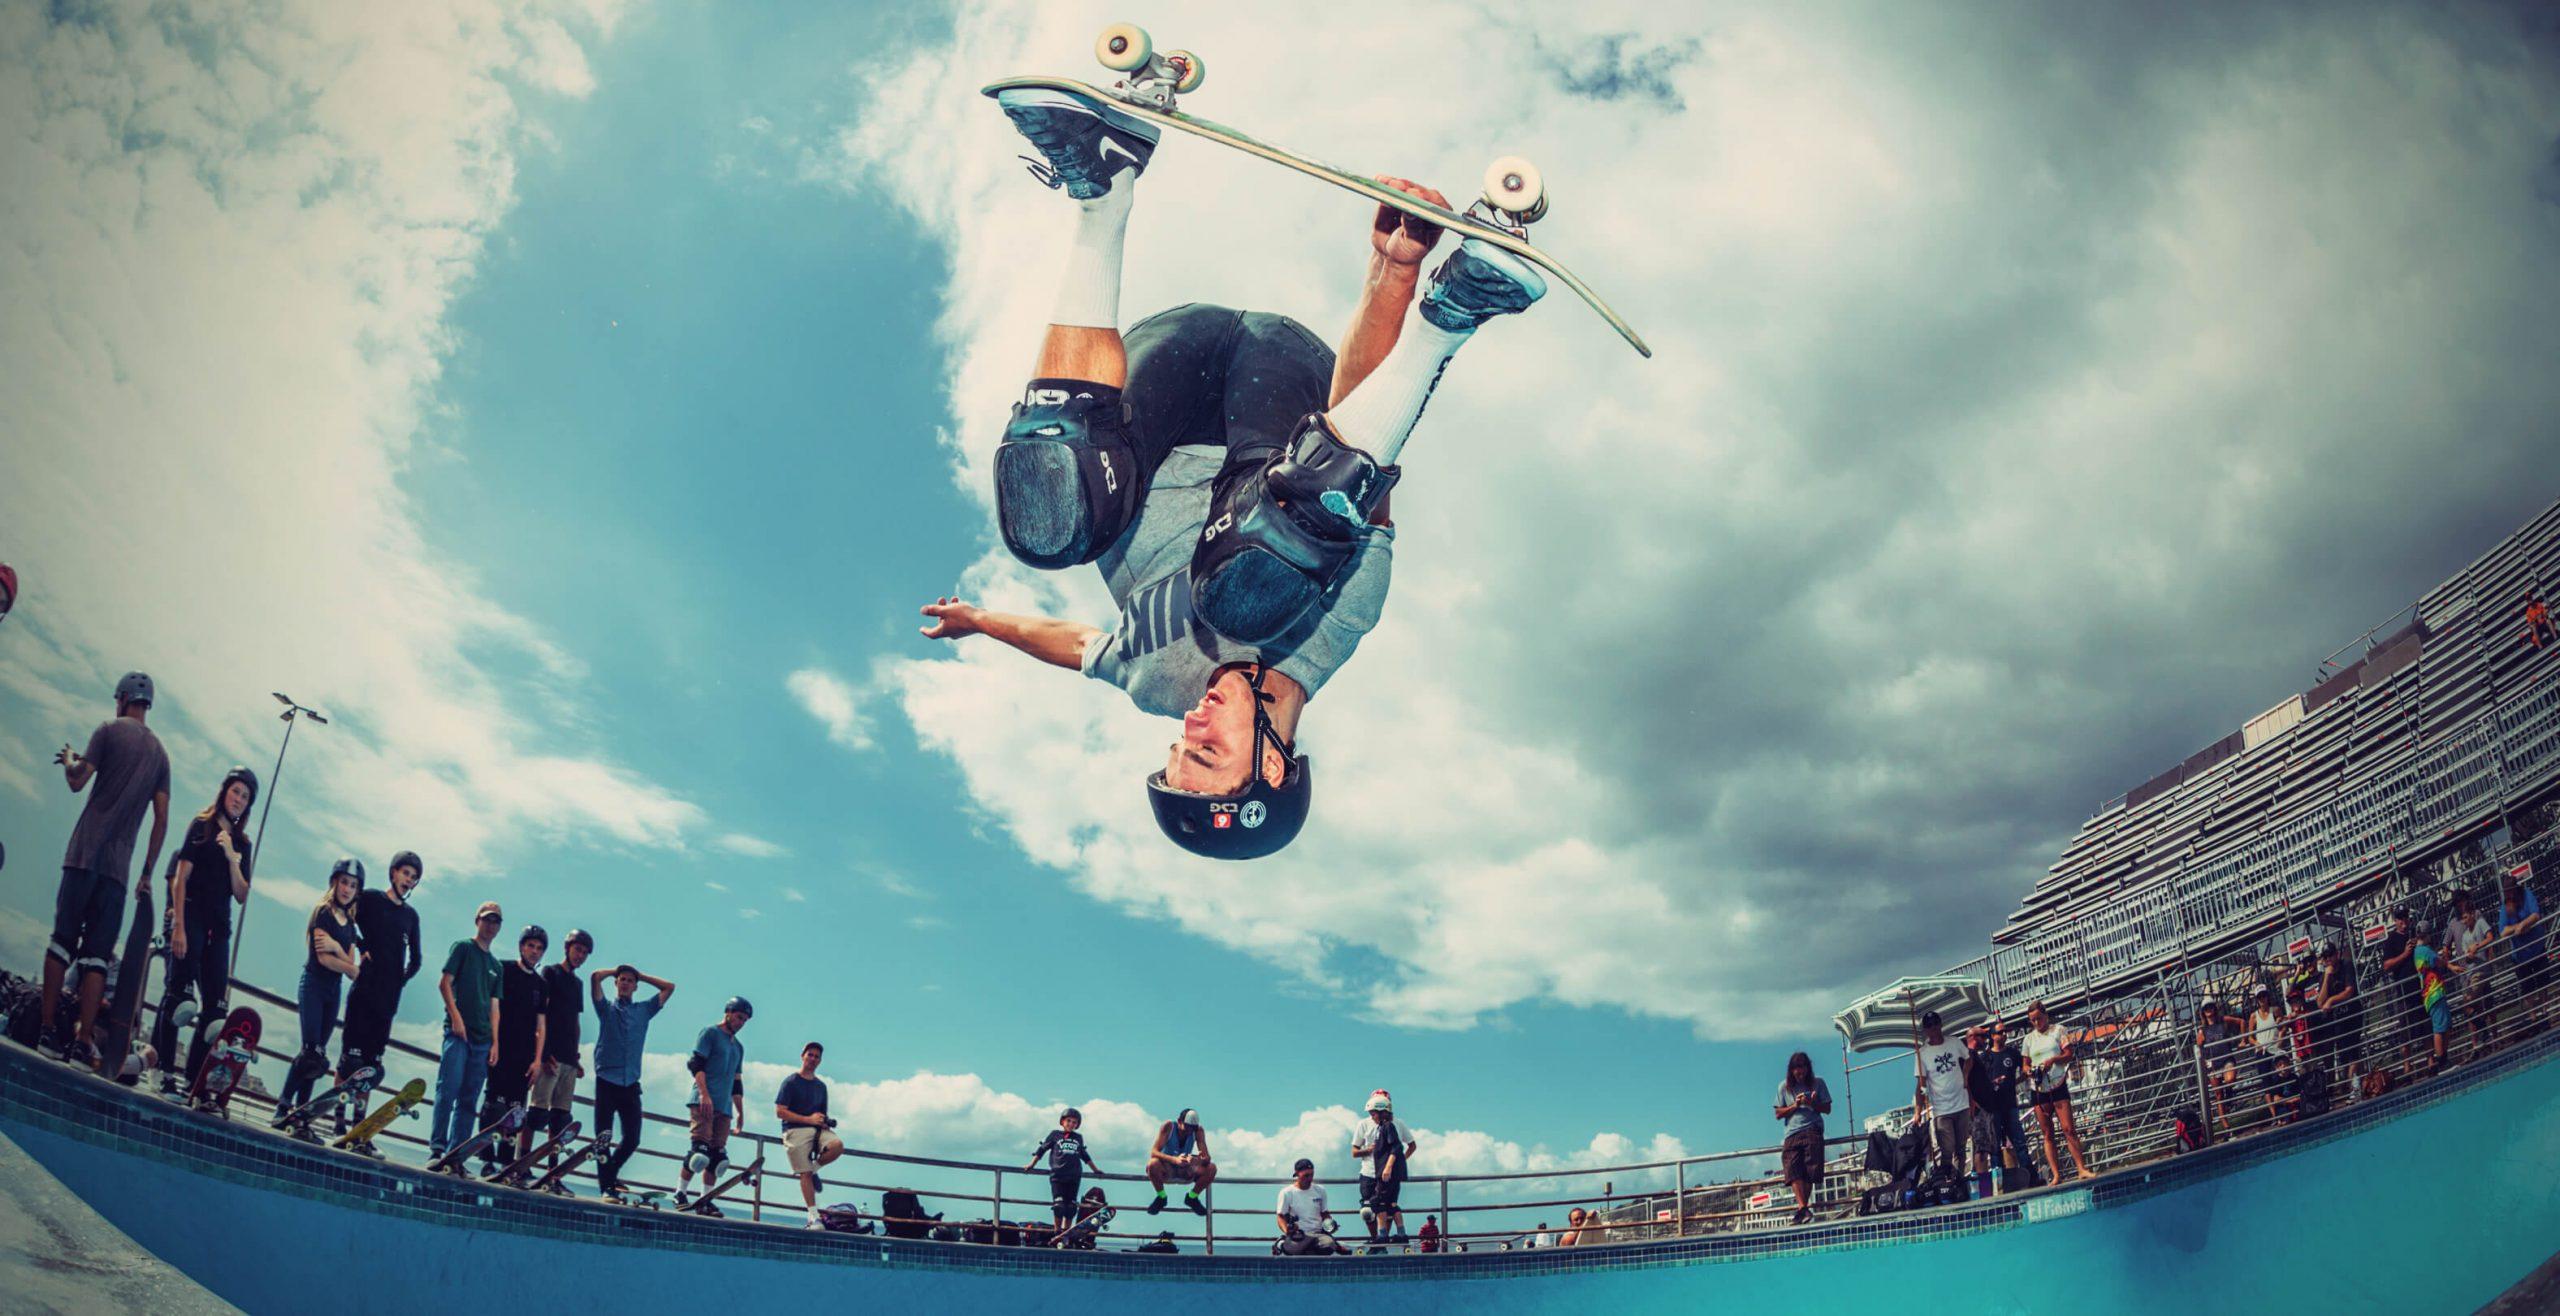 tsg team rider skateboarder jono schwan upside down